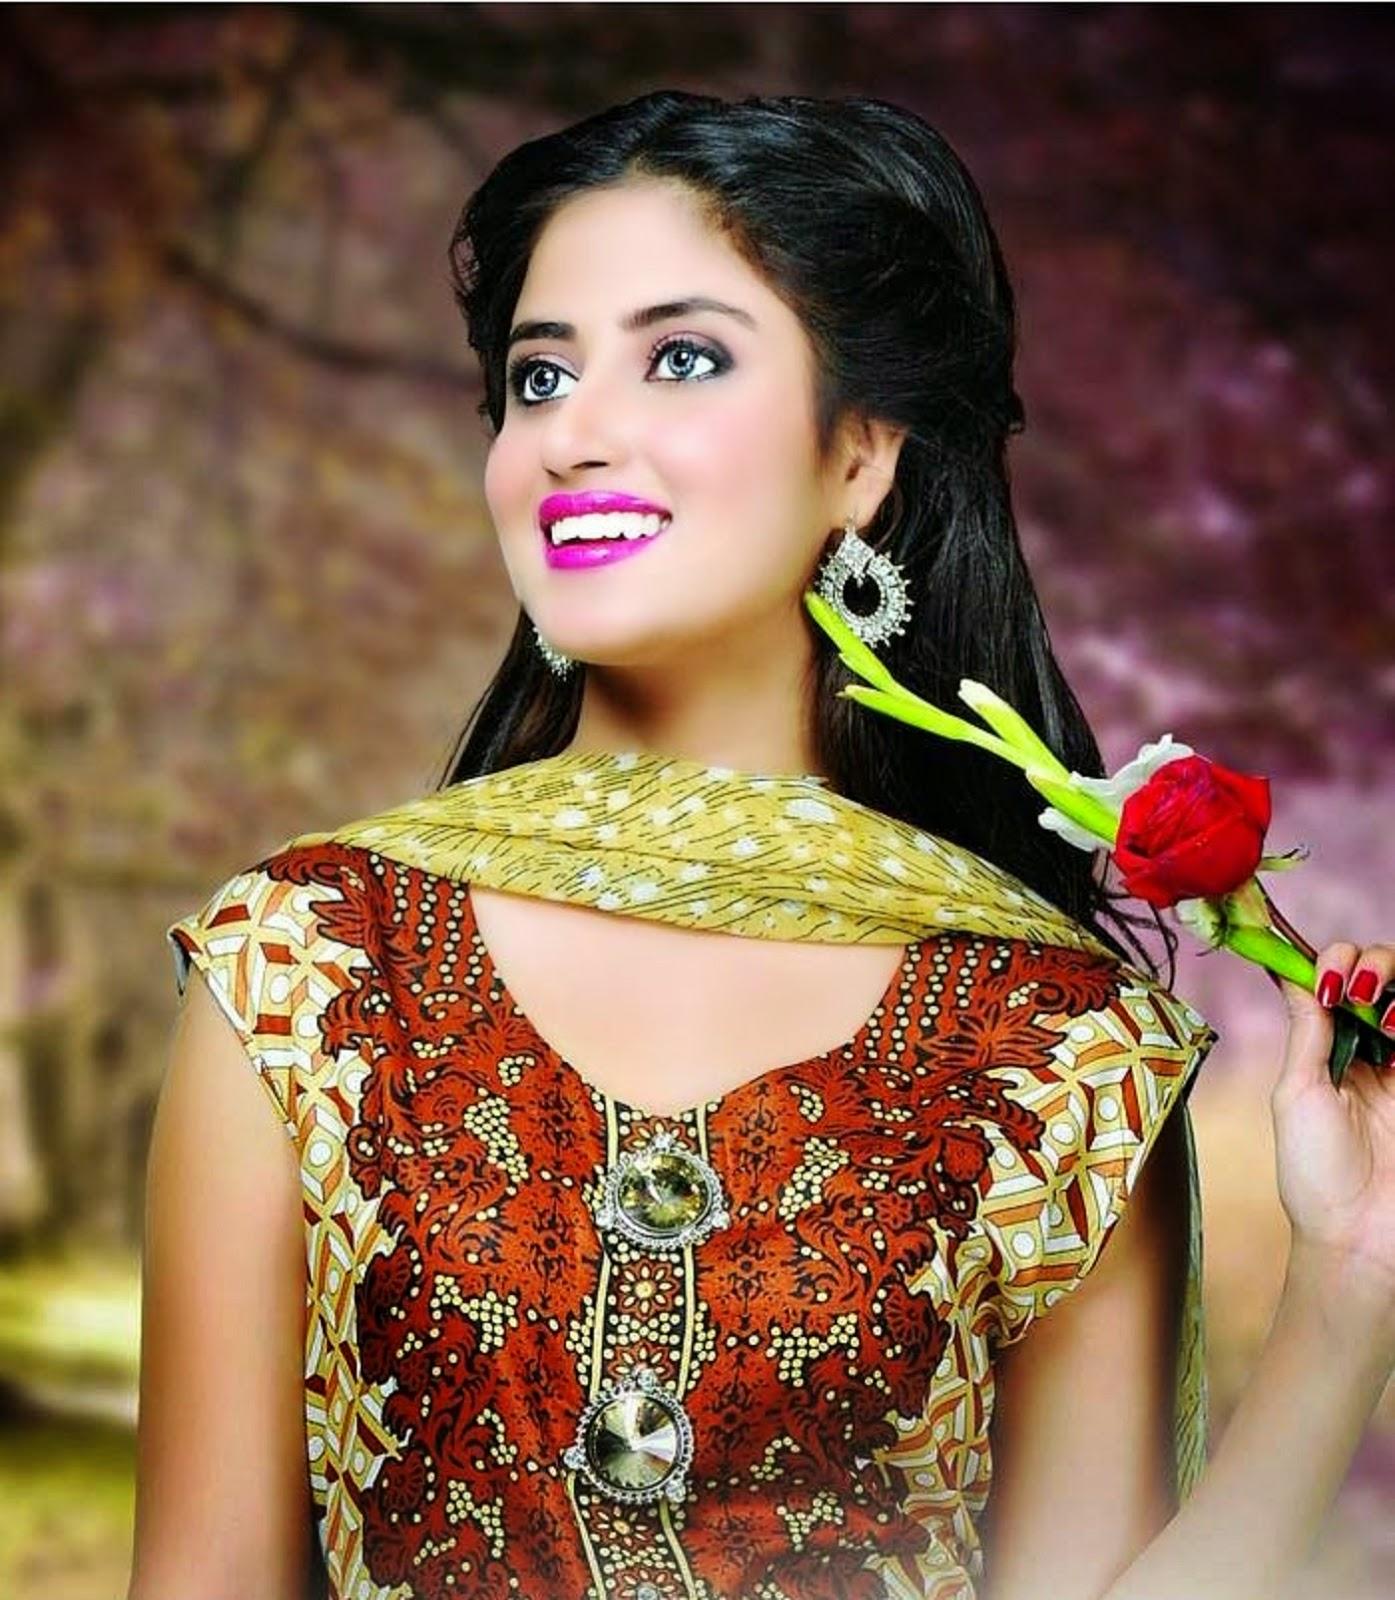 Dawood-Textiles-Aalishan-Chiffon-Lawn-Dresses-2016 sajal ali-webstudy.pk